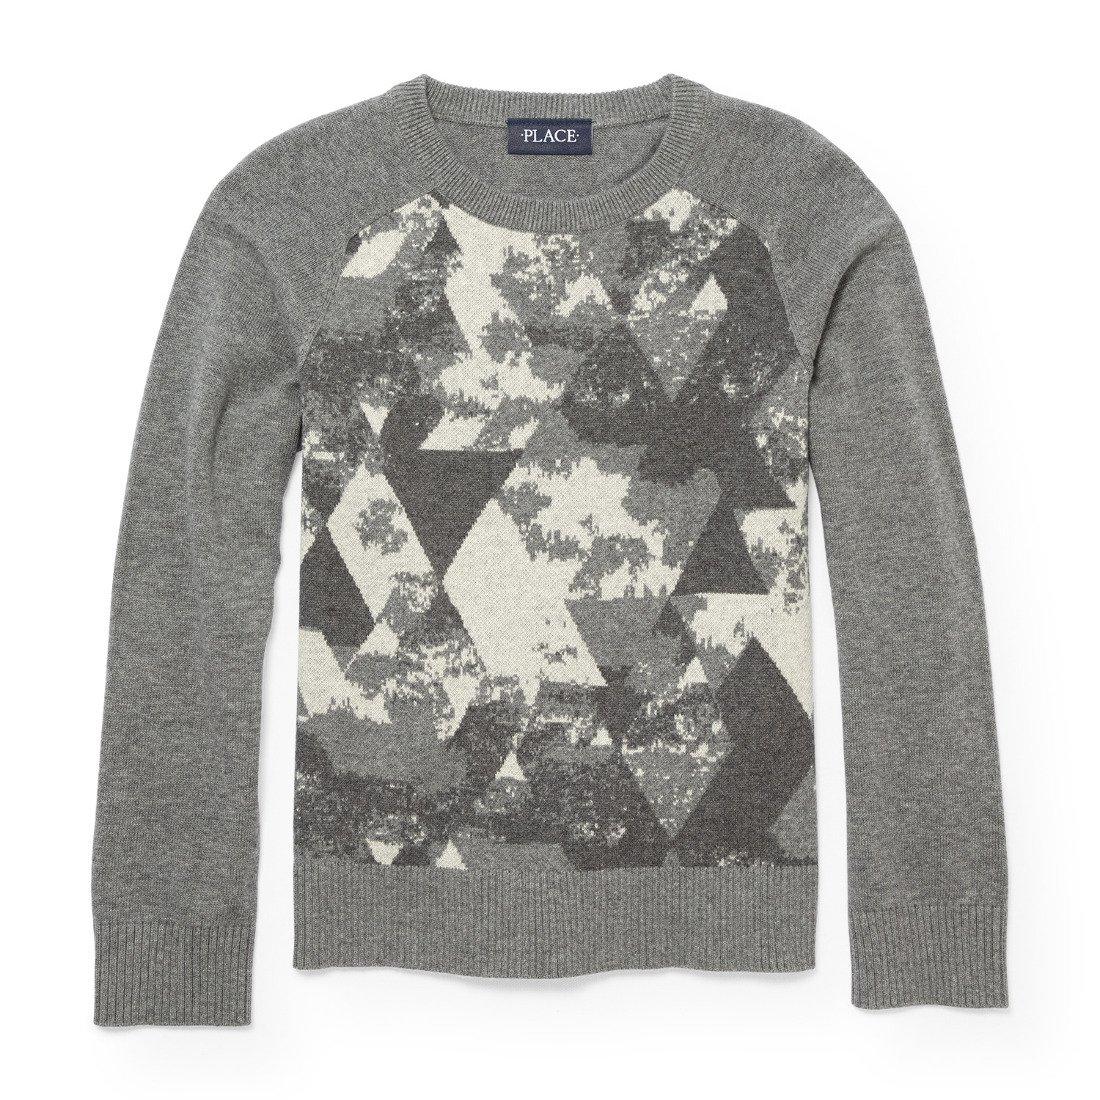 The Children's Place Little Boys' Sweaters, H/T Ash 87564, XS (4)